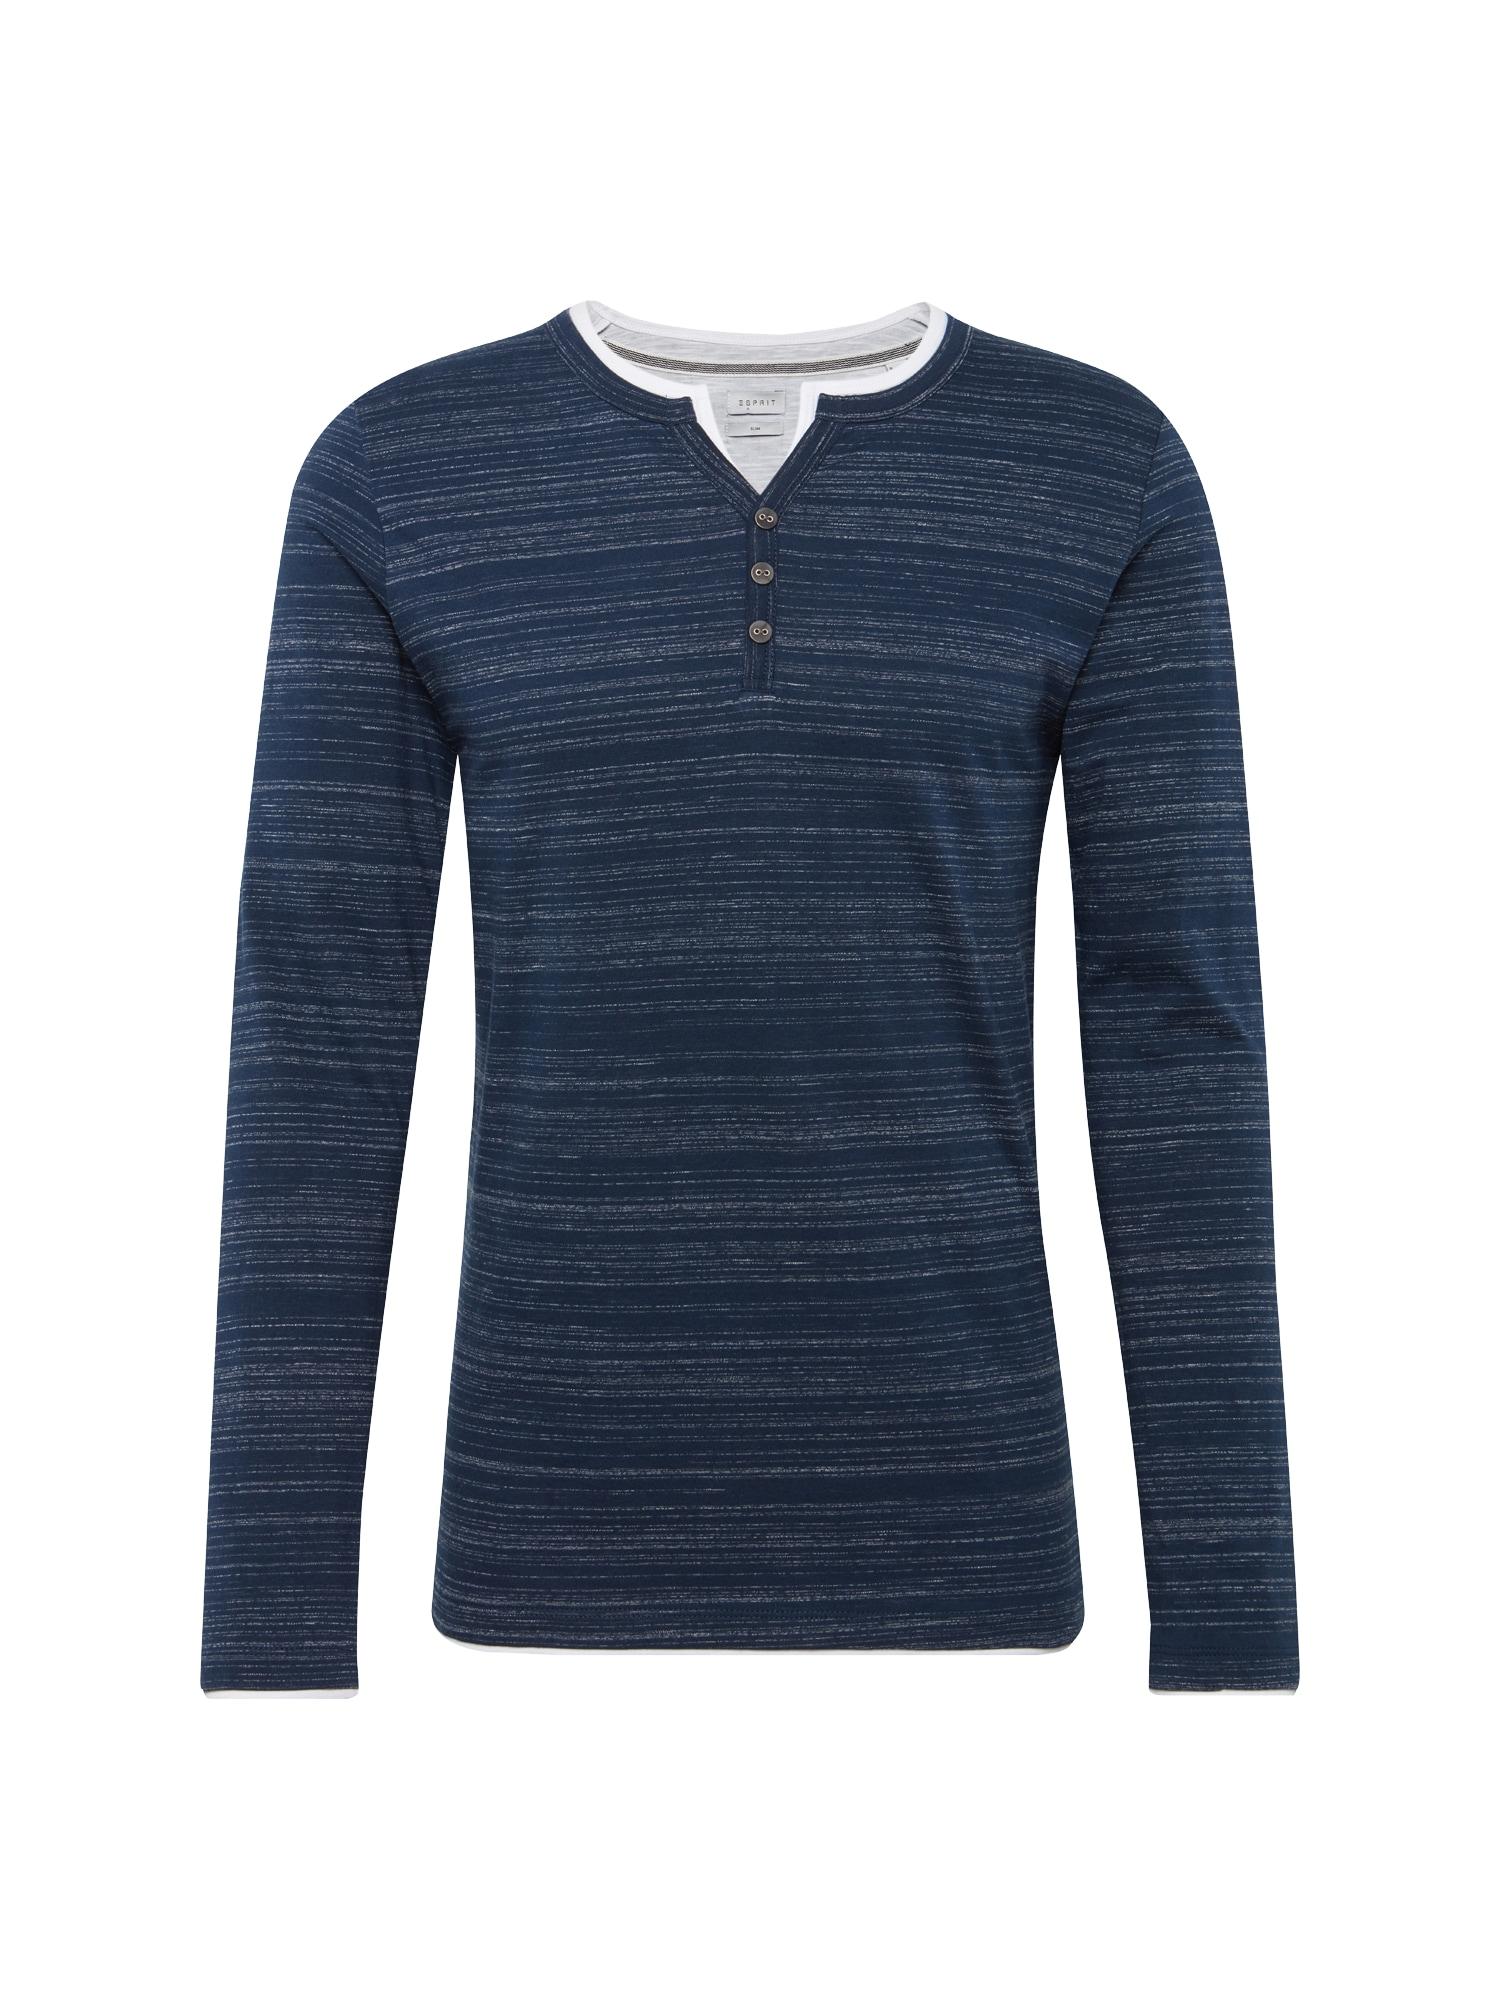 ESPRIT Marškinėliai 'N hen 2in1 ls' tamsiai mėlyna